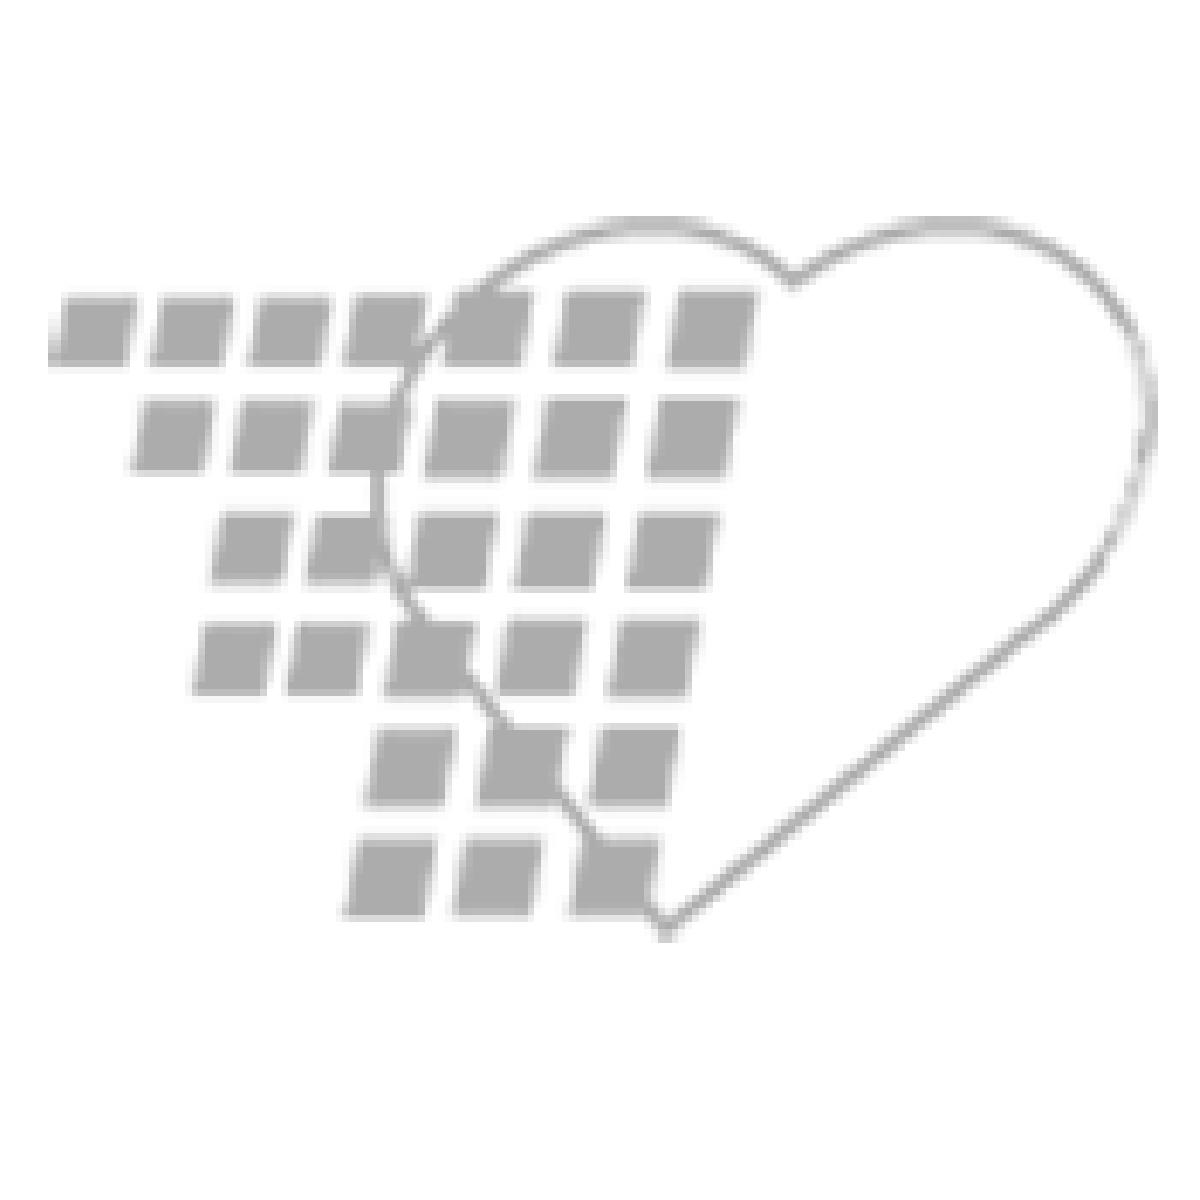 14-17-0795 - Nasco Life/form® Burn Simulation Kit